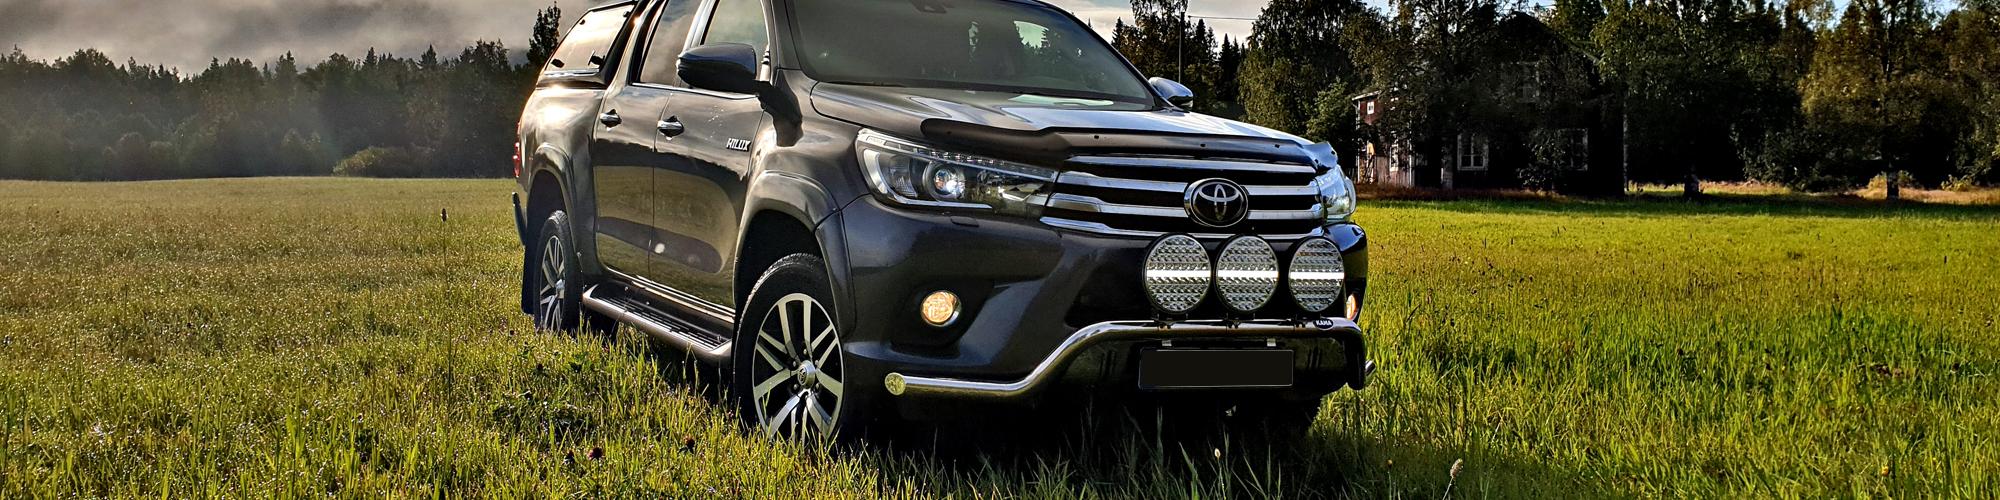 Frontbåge Toyota Hilux 16-20 bakgrundsbild